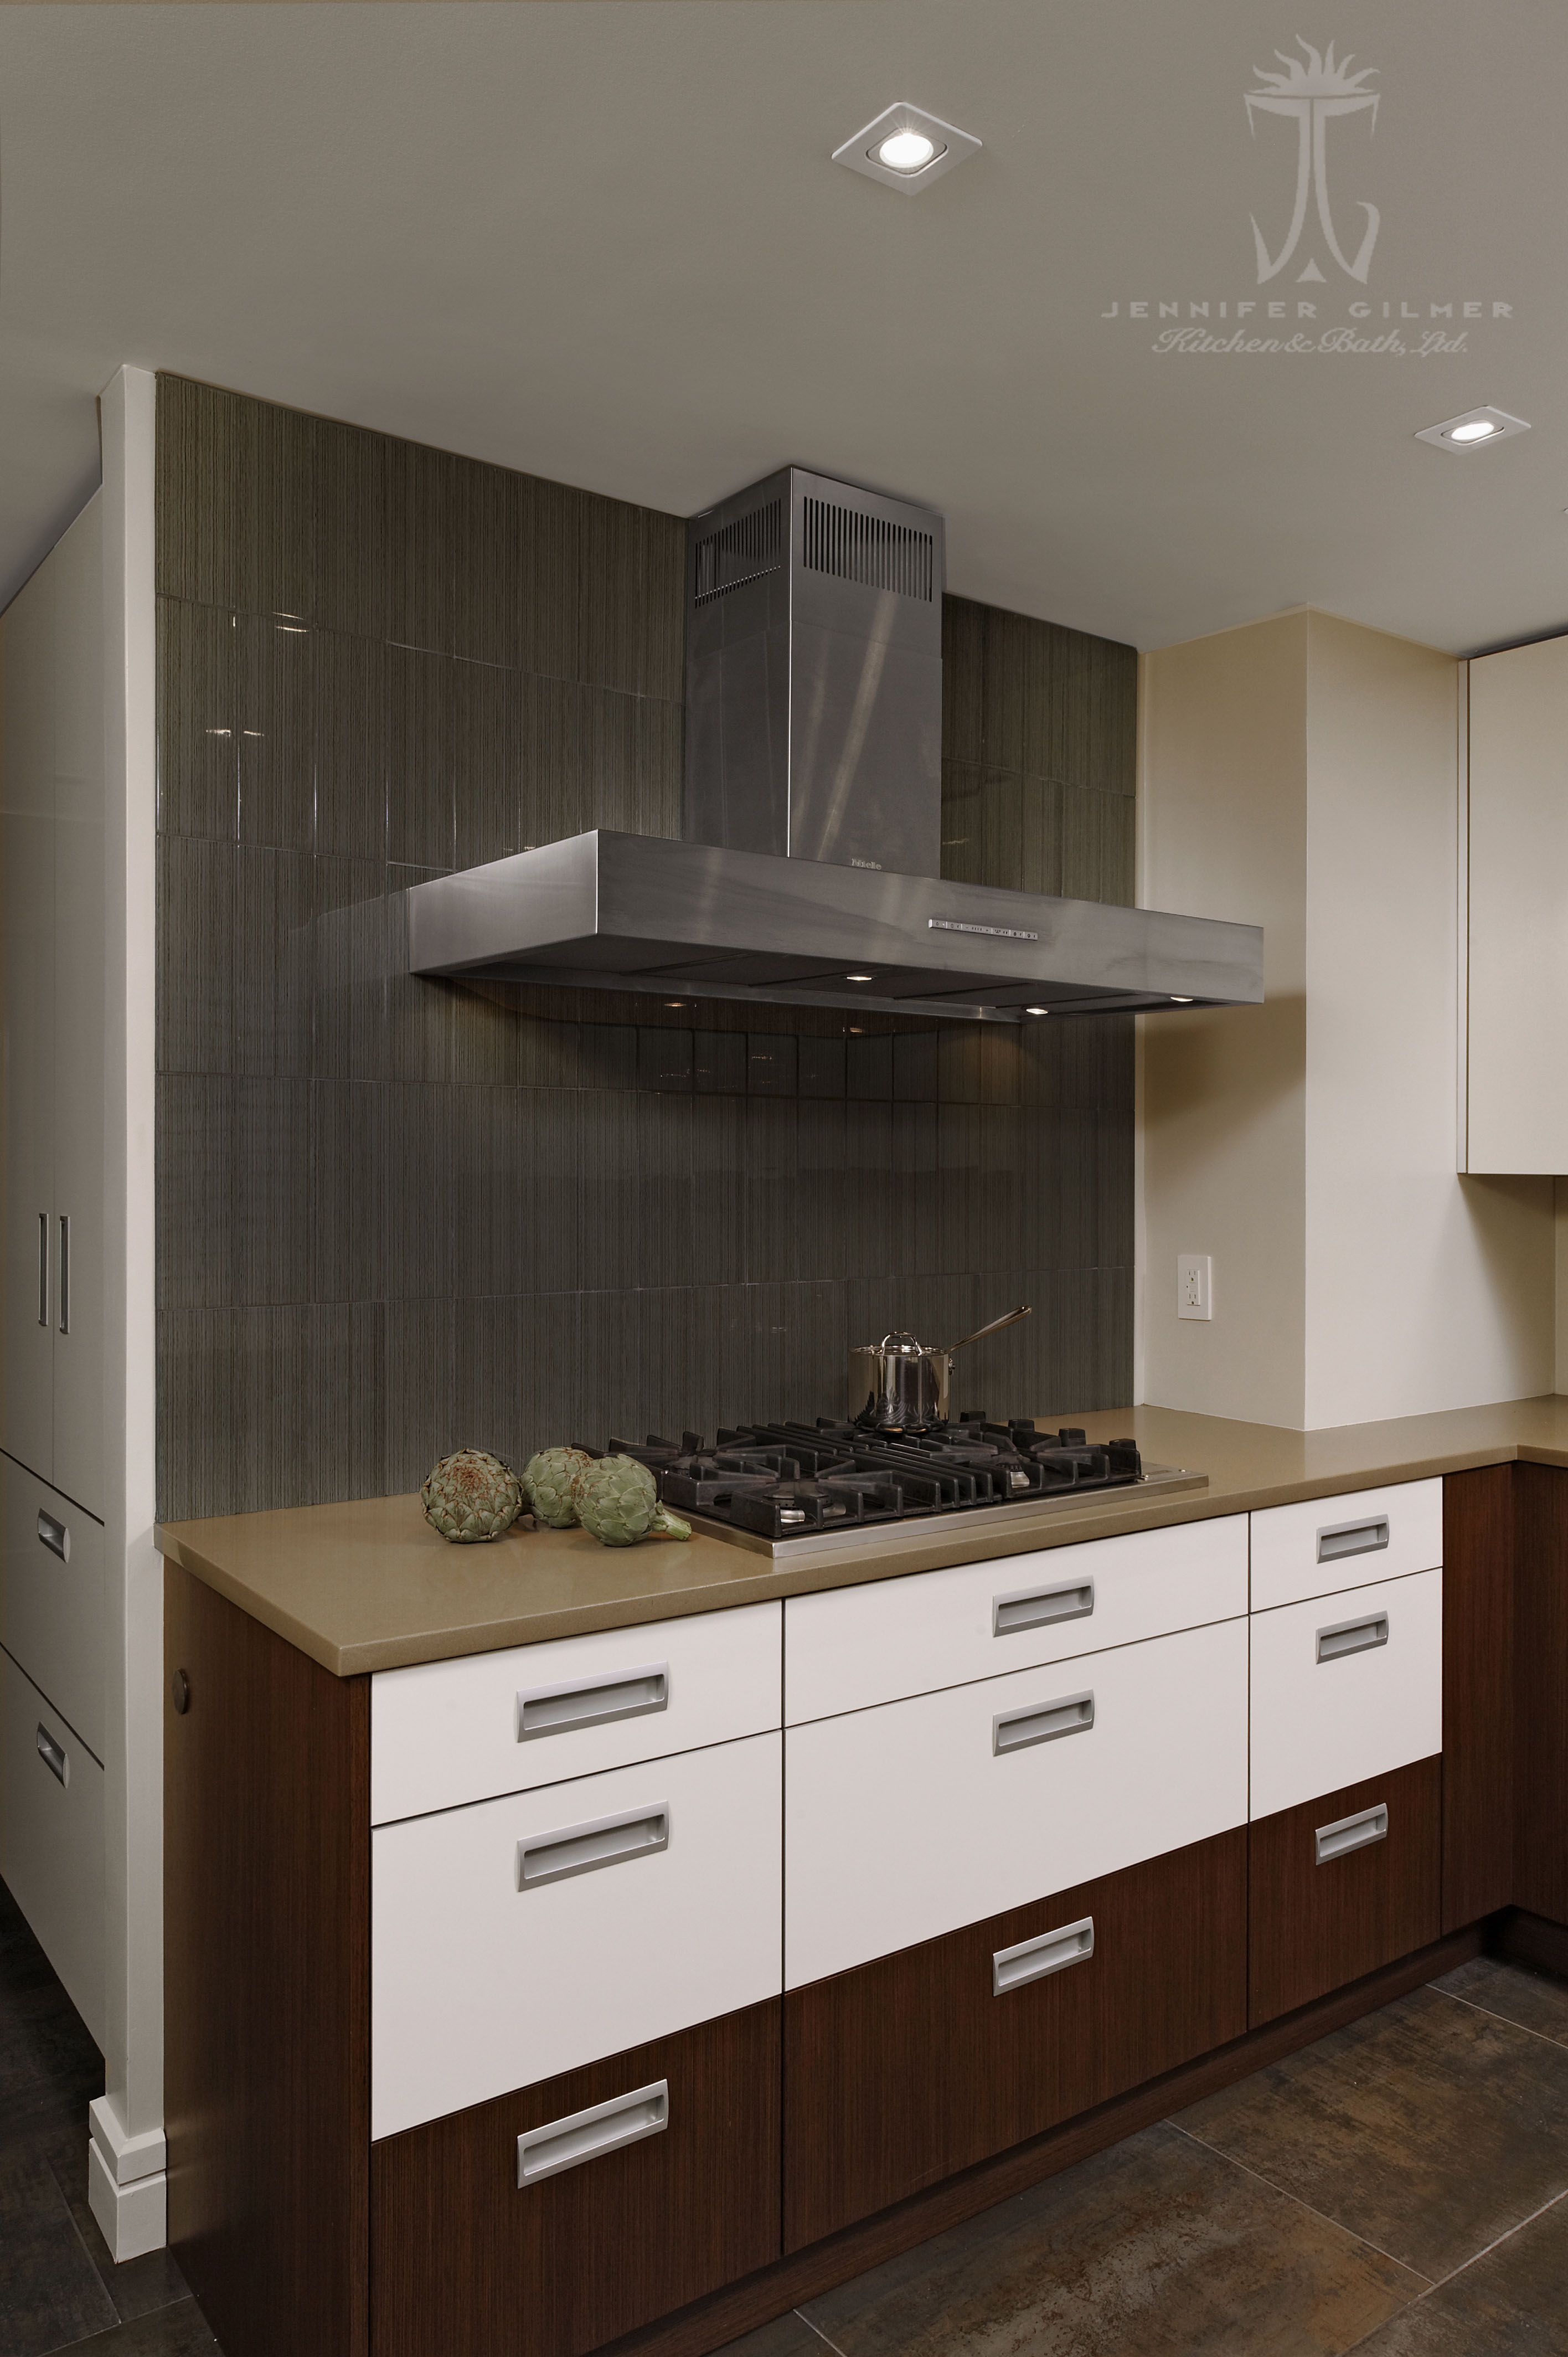 kitchen in bethesda maryland designed by